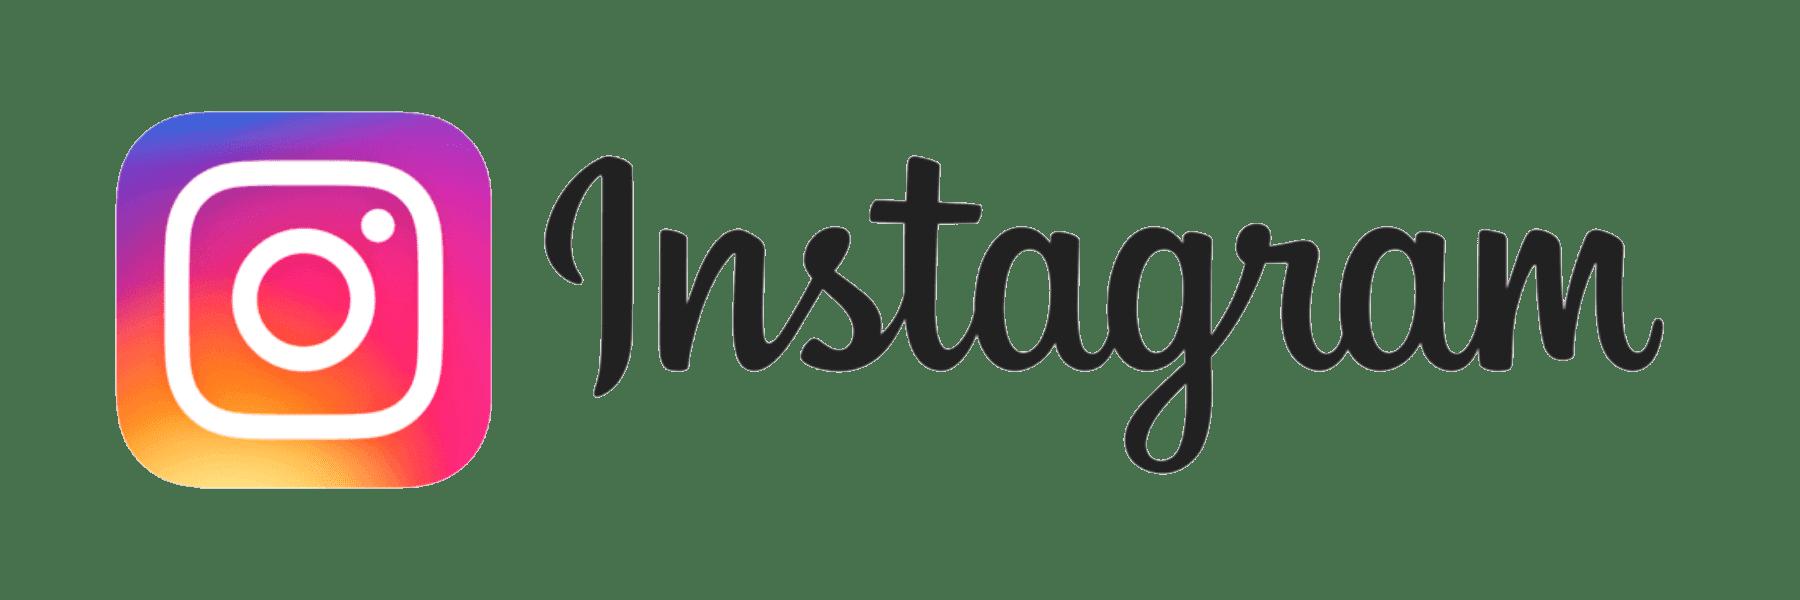 Bedeutung instagram symbole How to